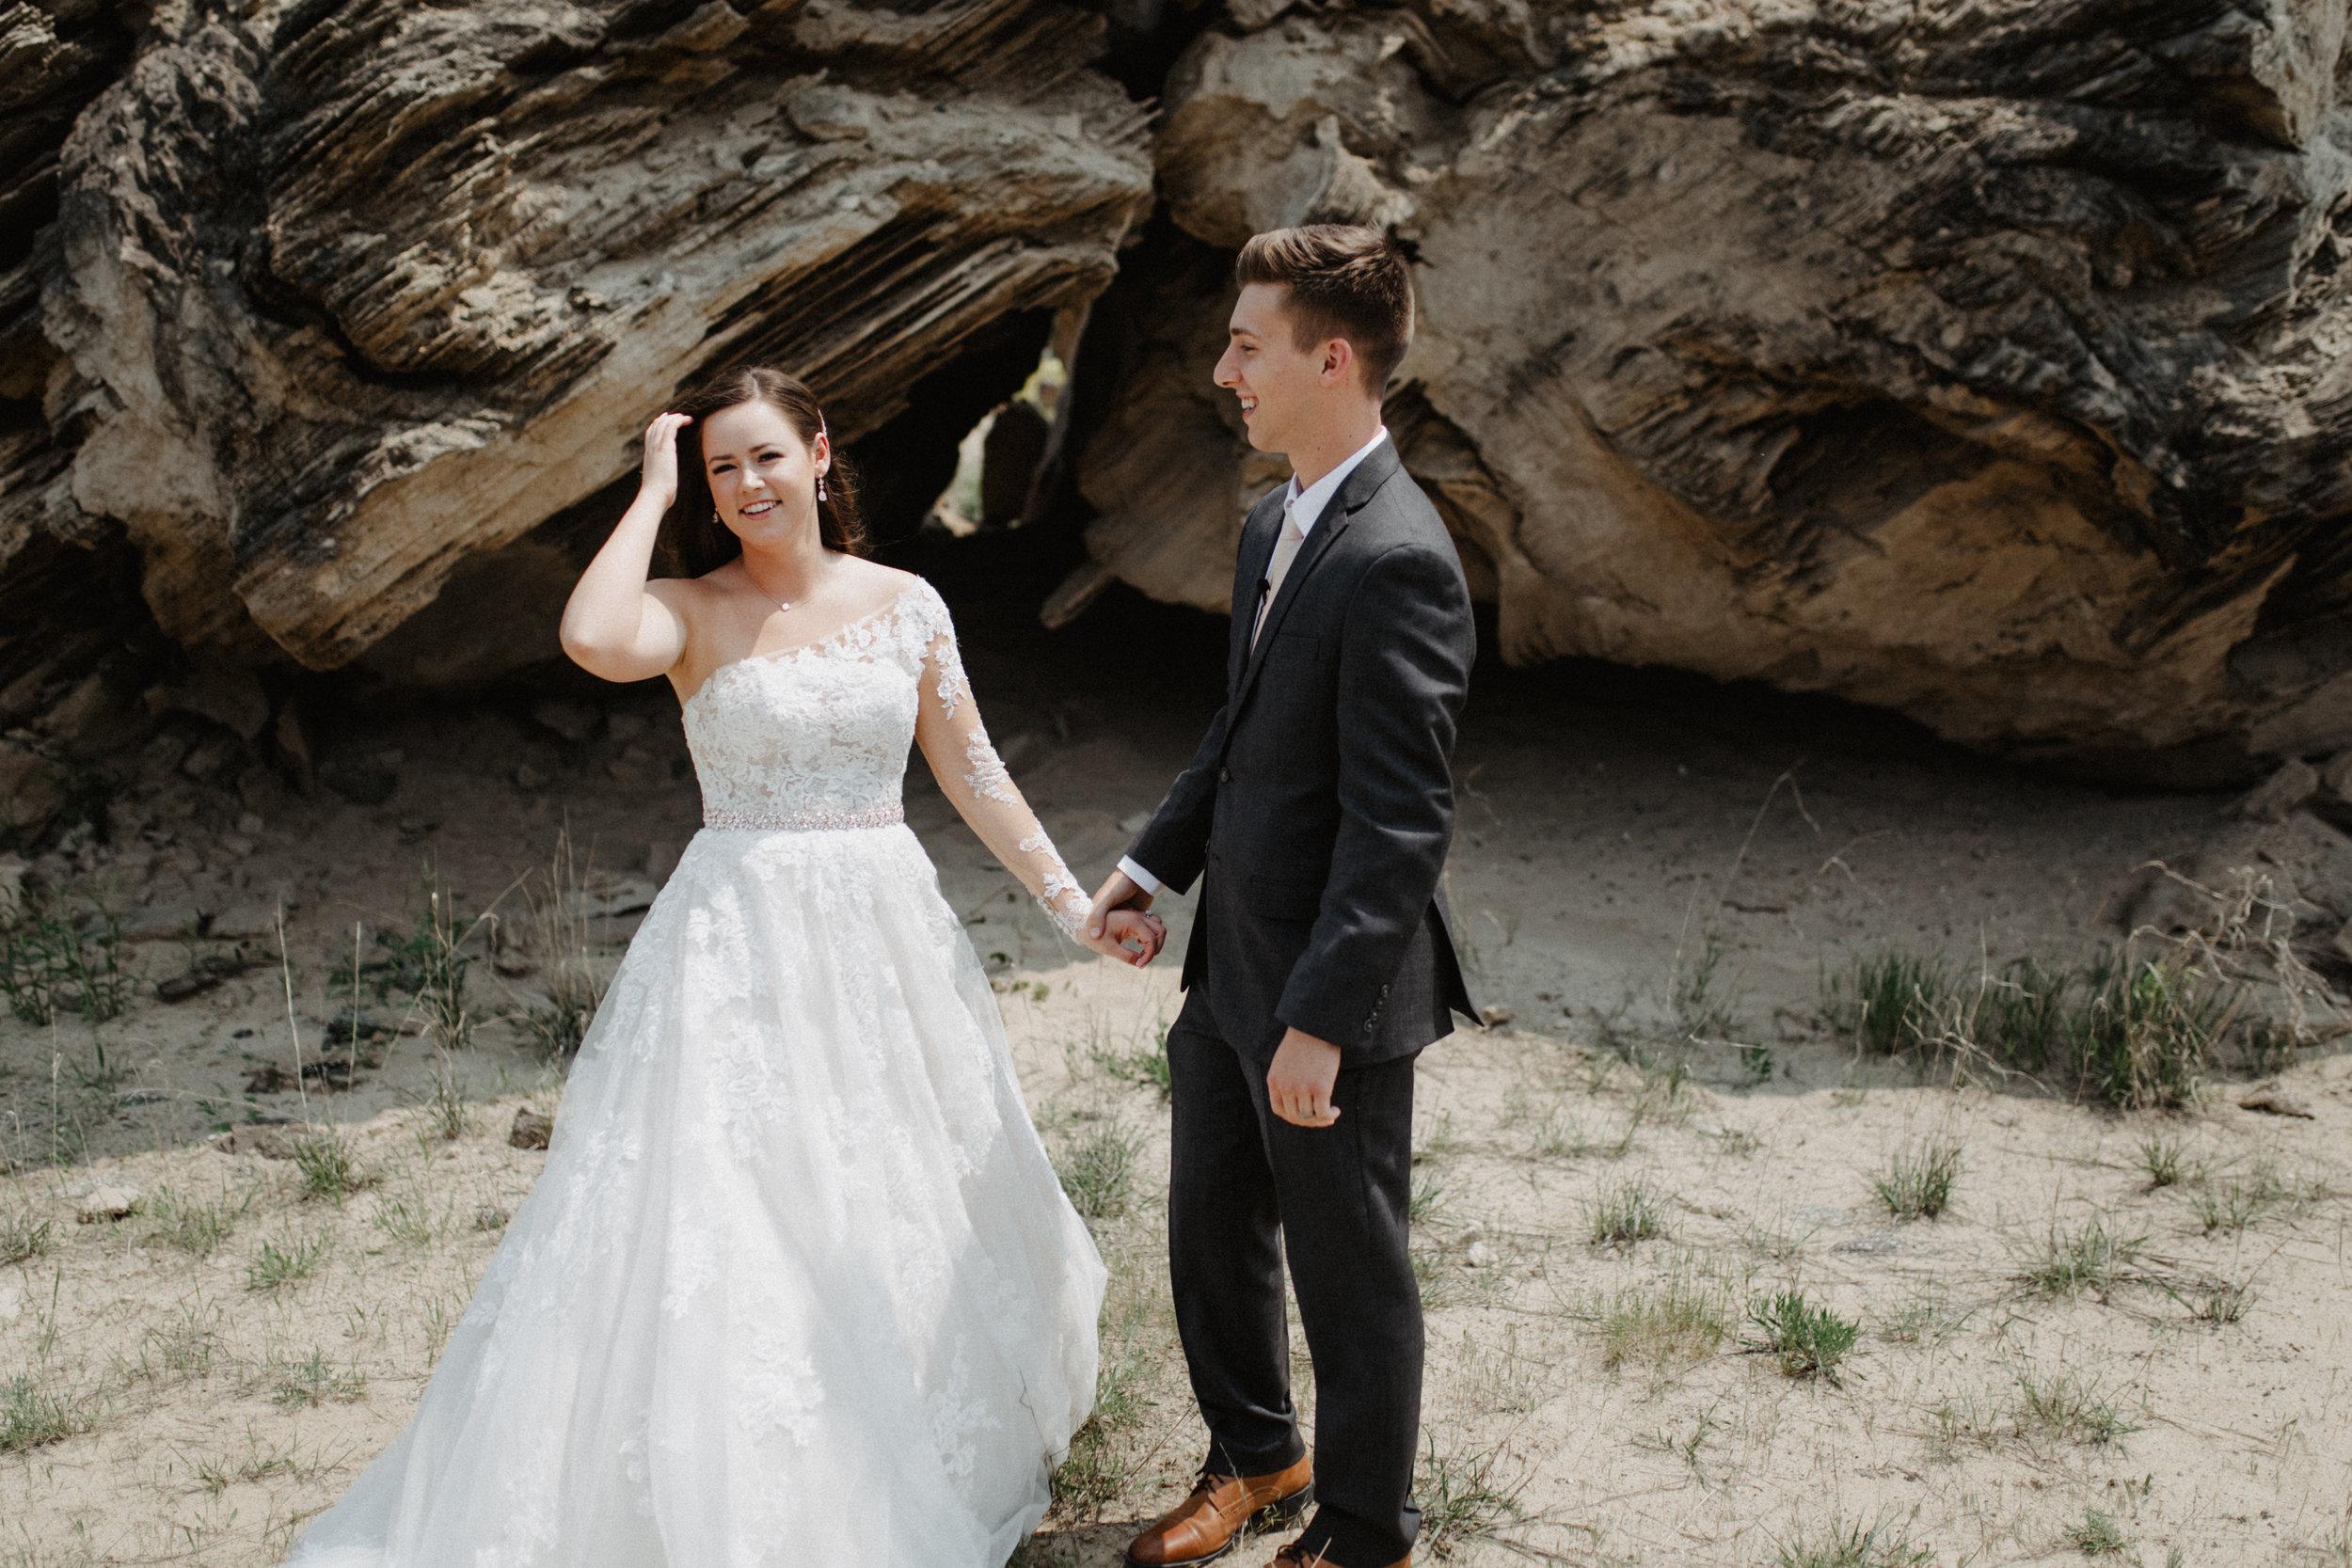 GRAYCENTOMHAMILTON-GRAND-RAPIDS-WEDDING-PHOTOGRAPHY-18.jpg